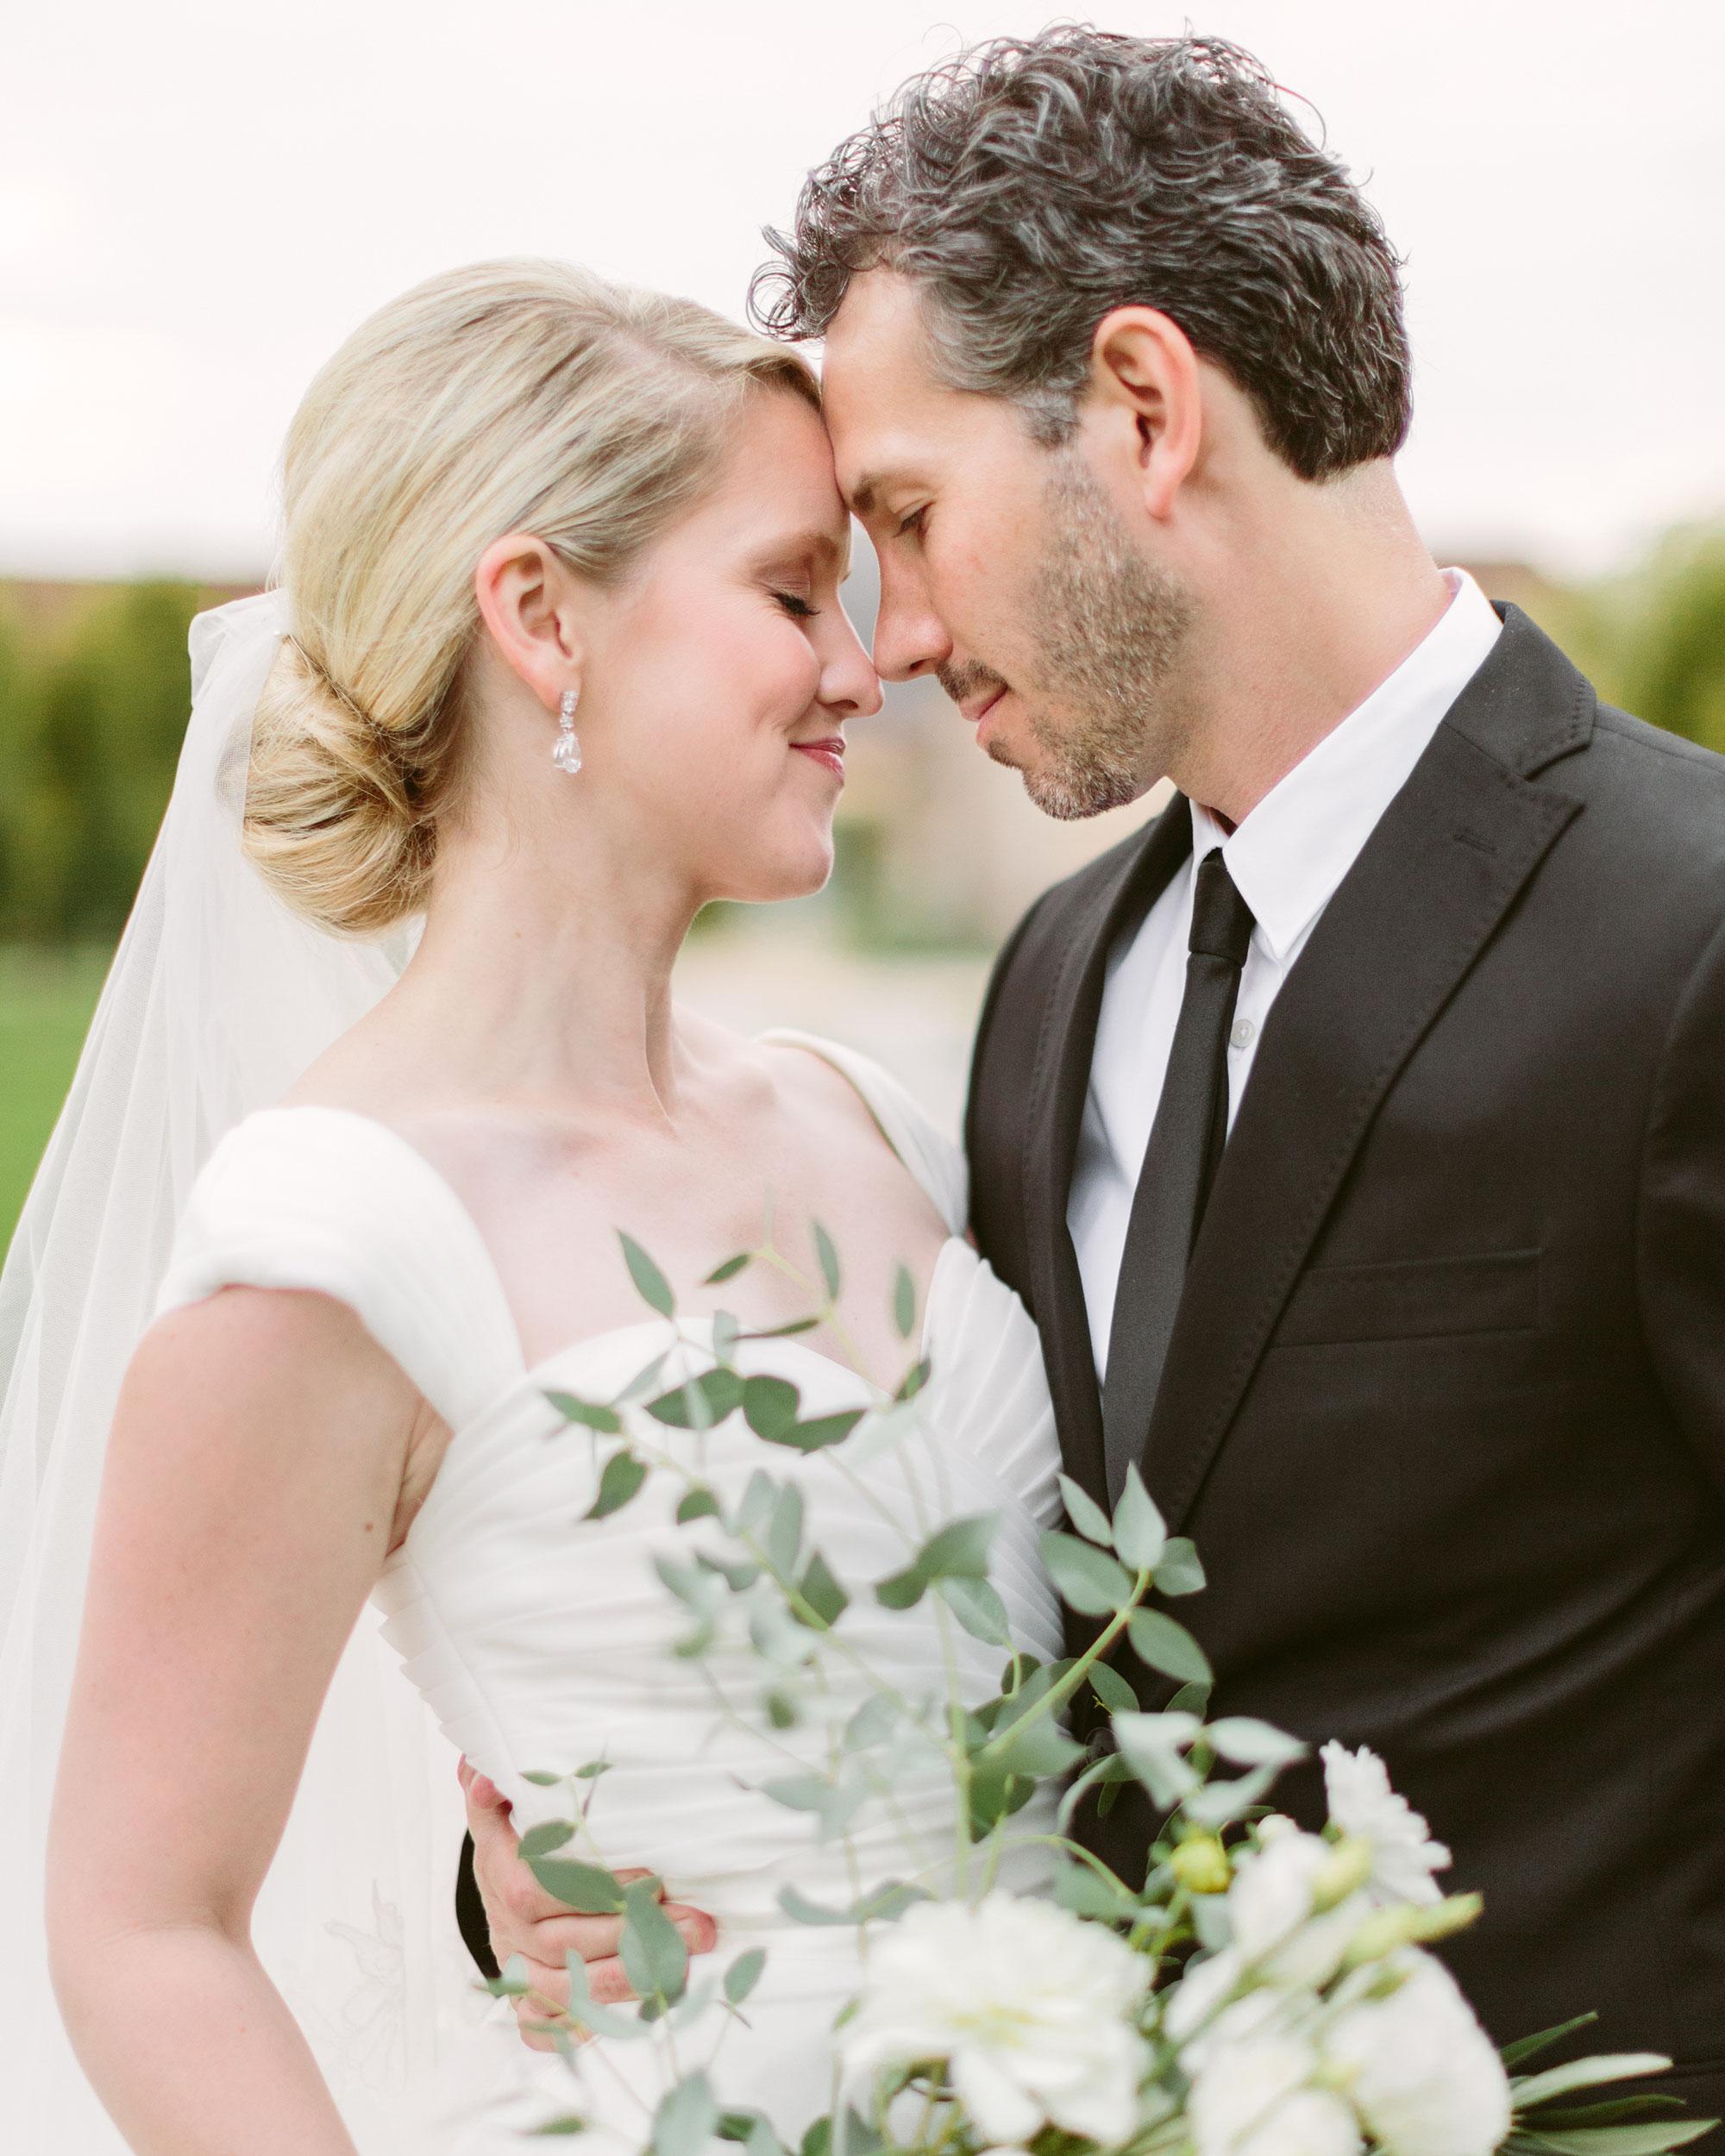 anneclaire-chris-wedding-france-couple-034-s113034-00716.jpg